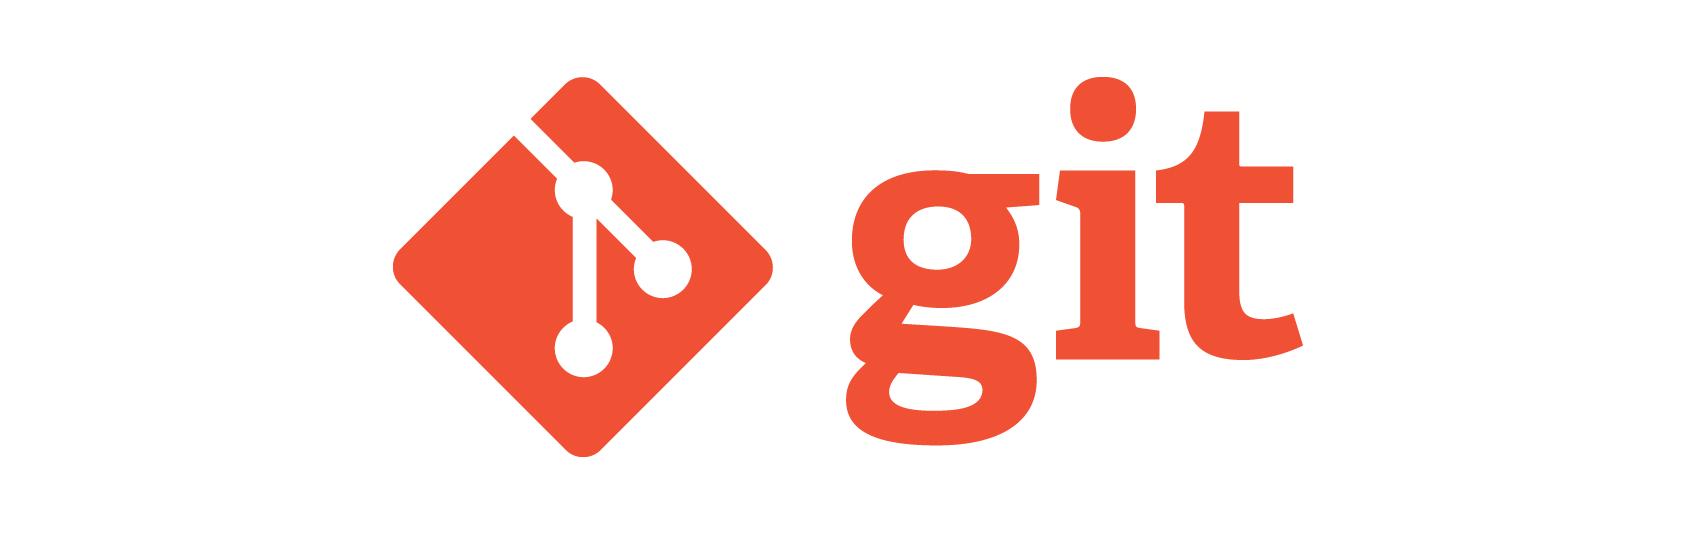 ���������� � Git: ���������� ������������ ������